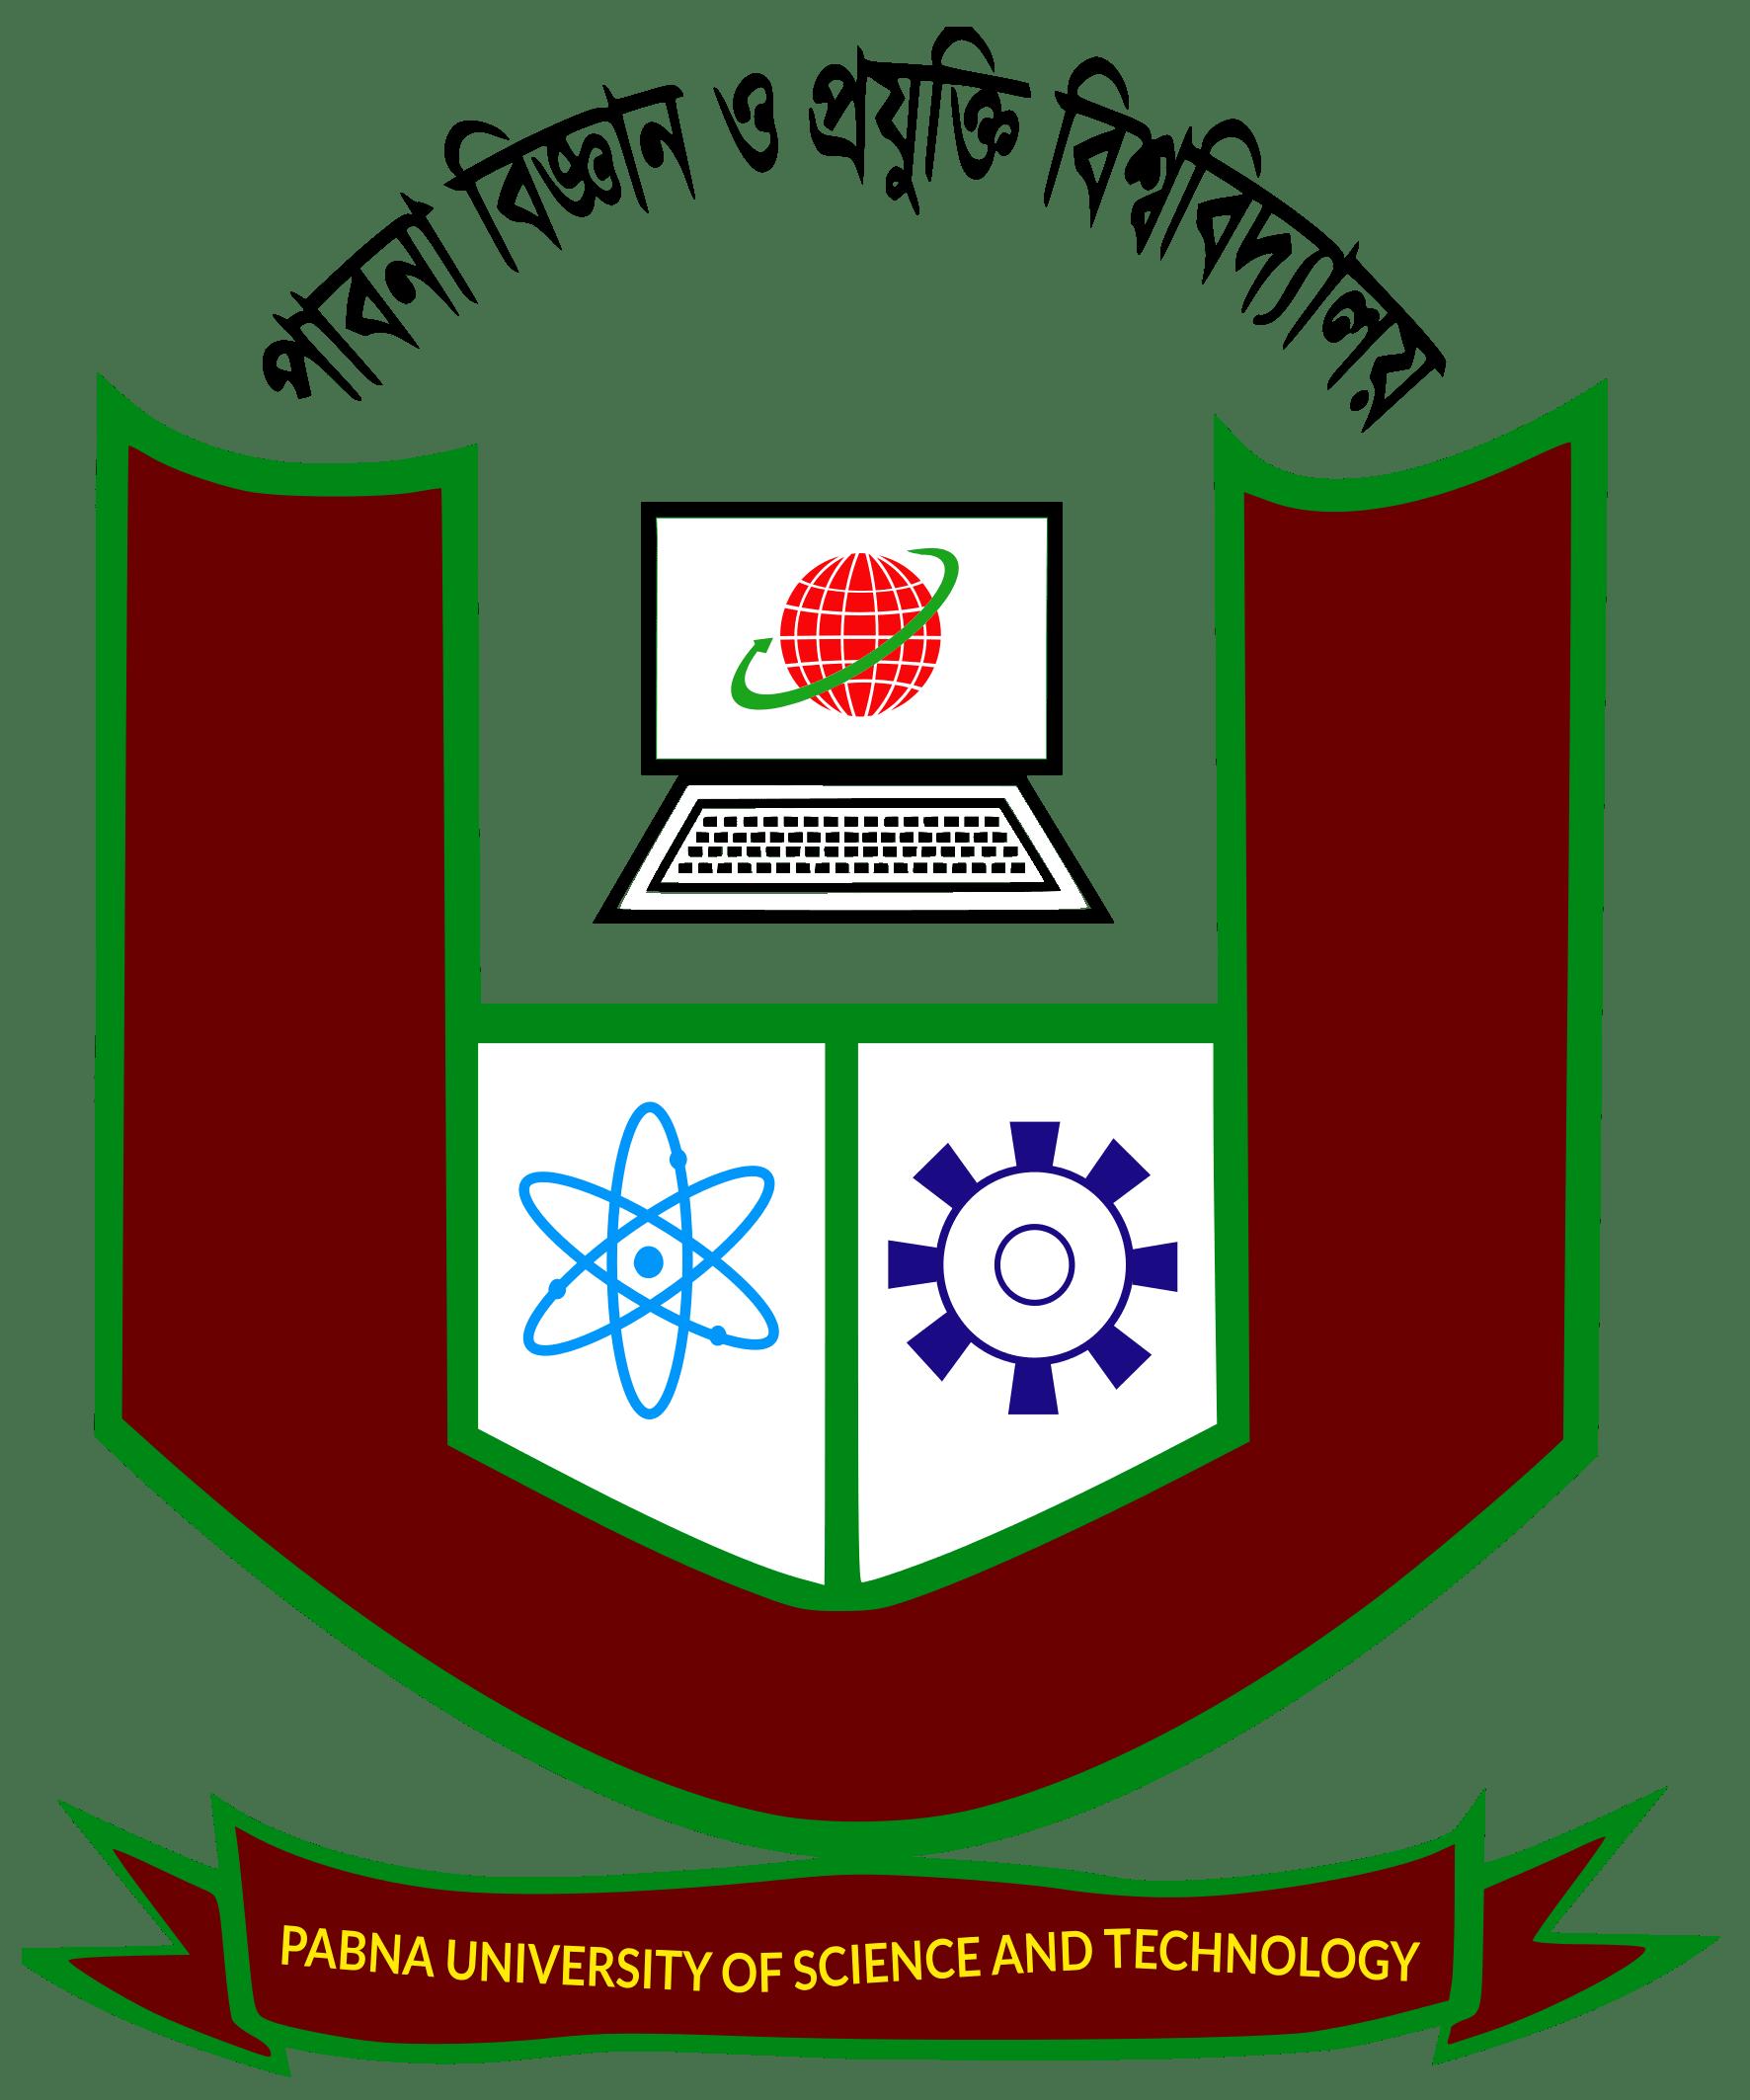 Pabna University of Science and Technology